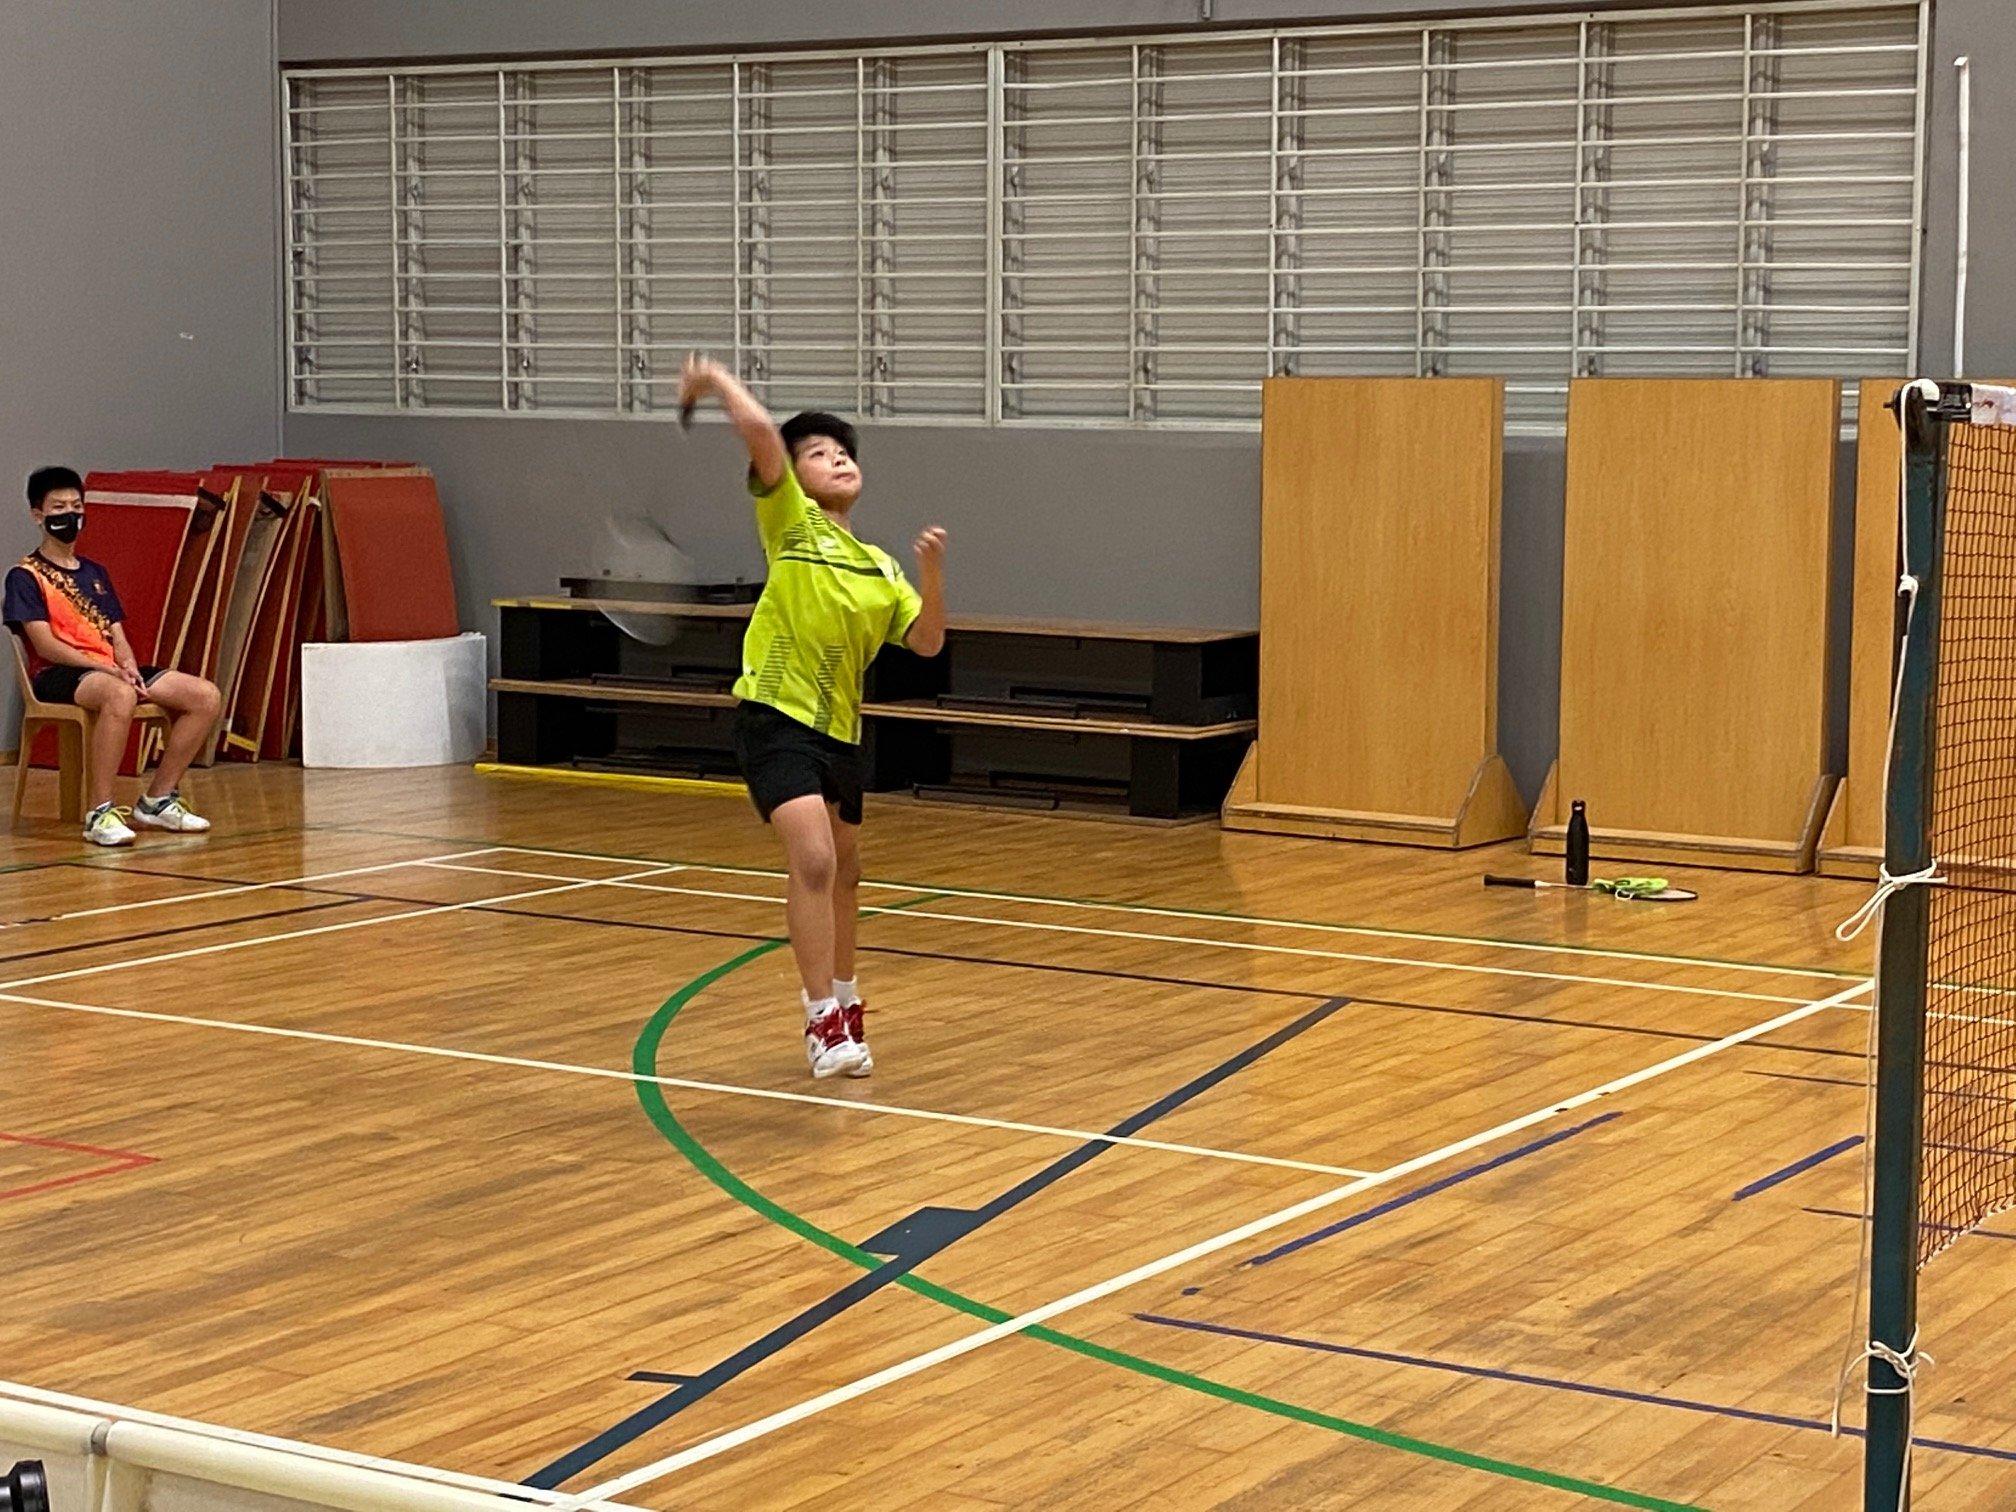 NSG Snr Div South Zone boys' badminton_ SJI Junior second singles